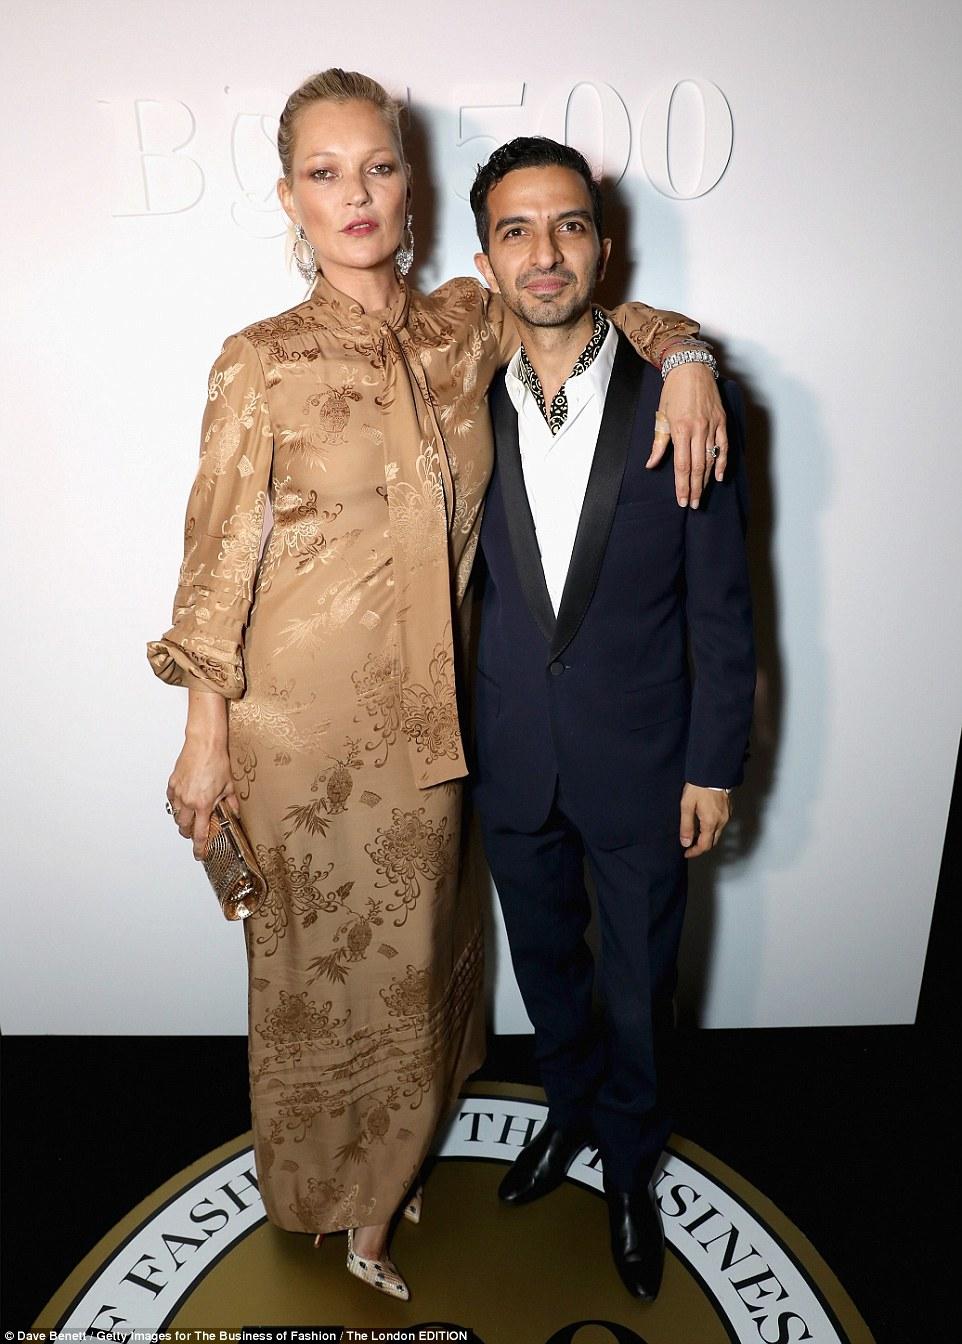 Kate Moss leads the fashion pack at Miu Miu London's pop-up club